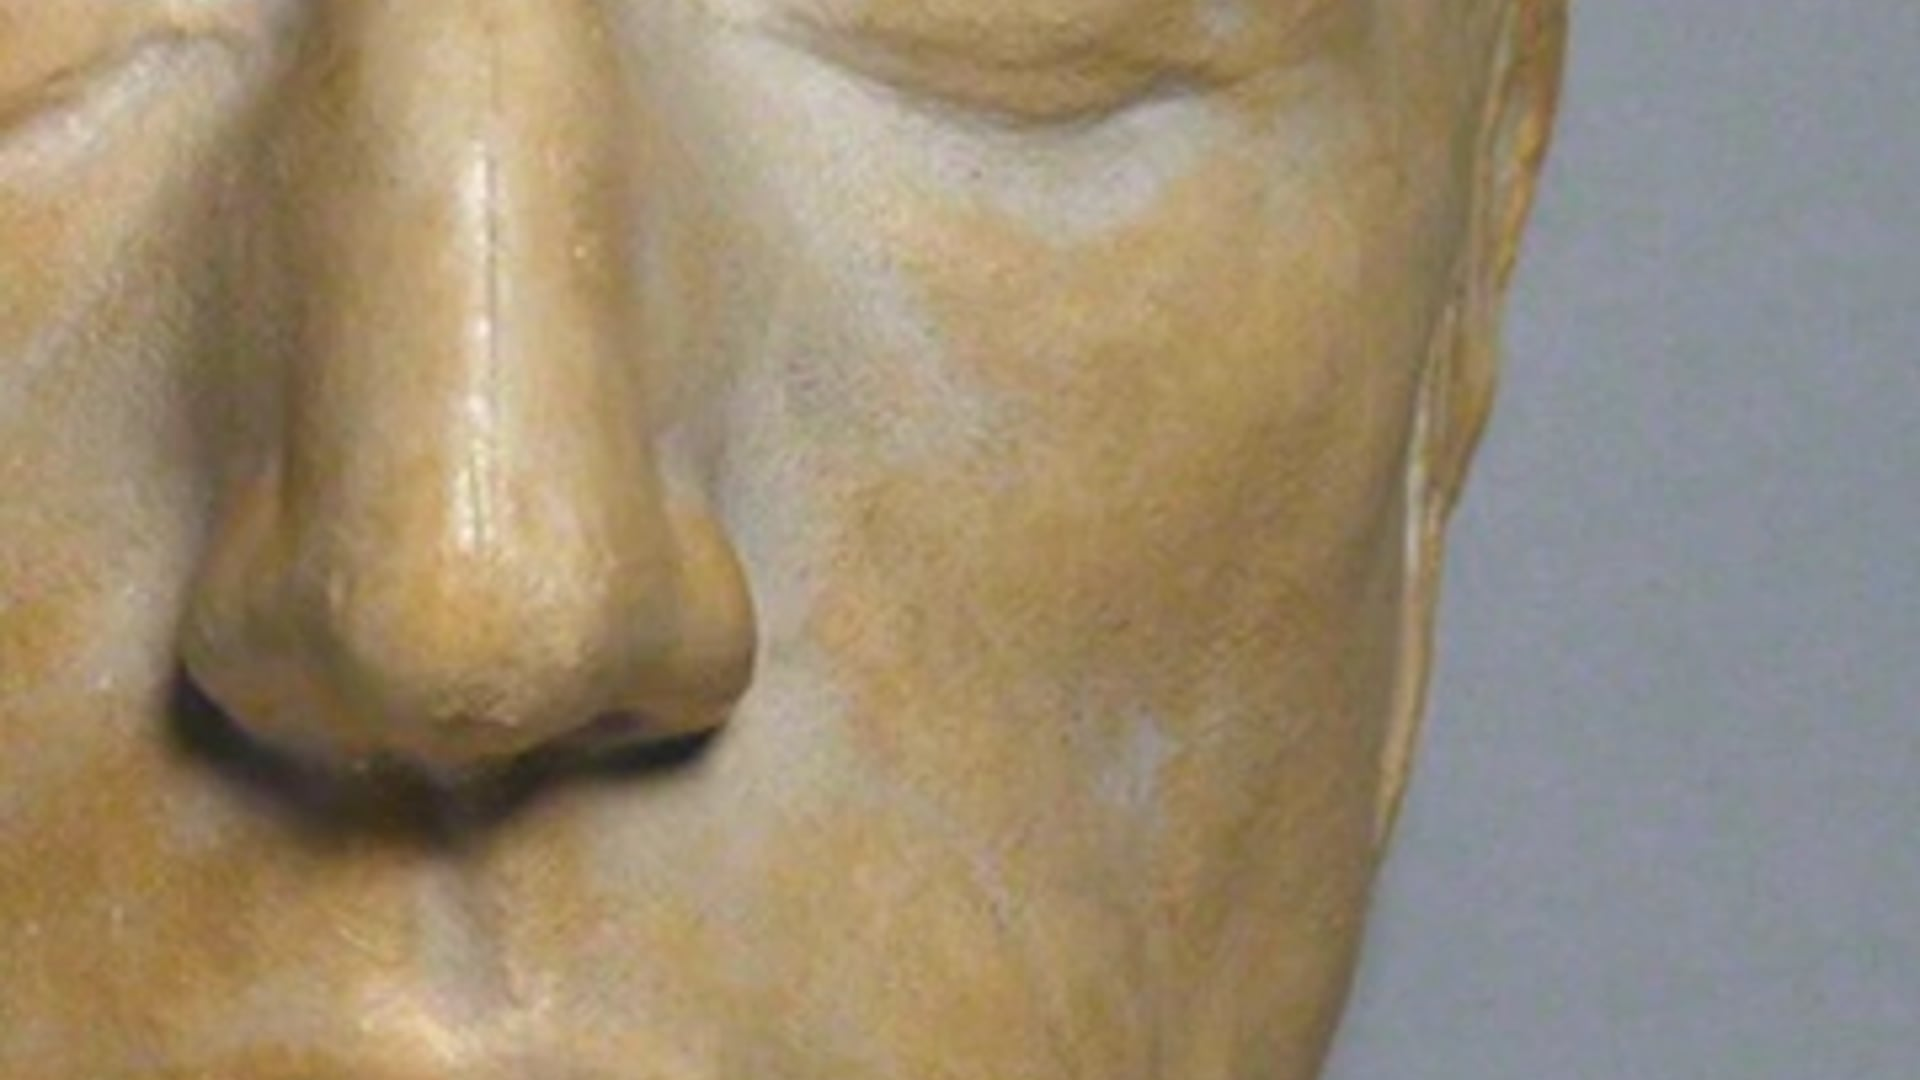 Portrait of William Wordsworth developed based on his life mask